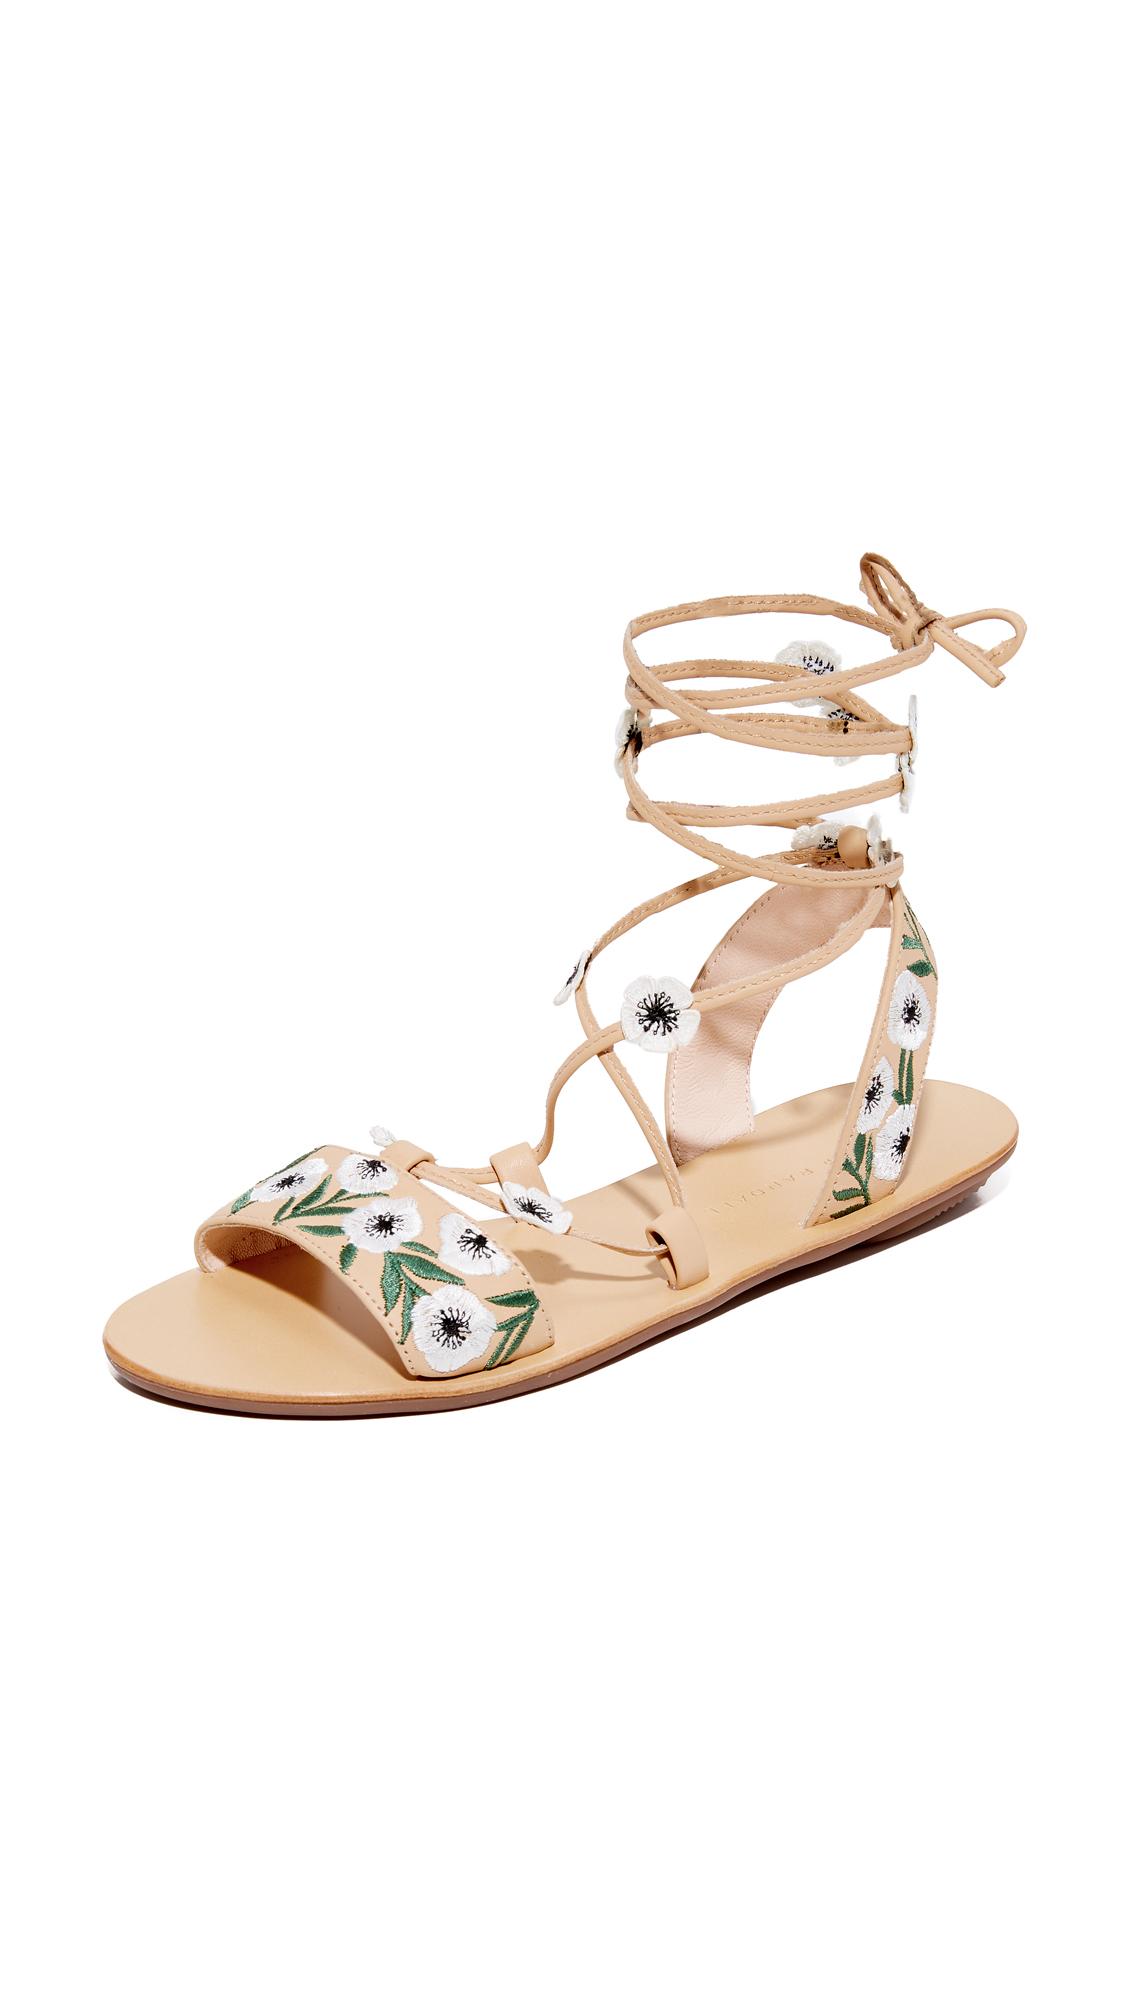 Loeffler Randall Fluera Wrap Sandals - Wheat/Anemone